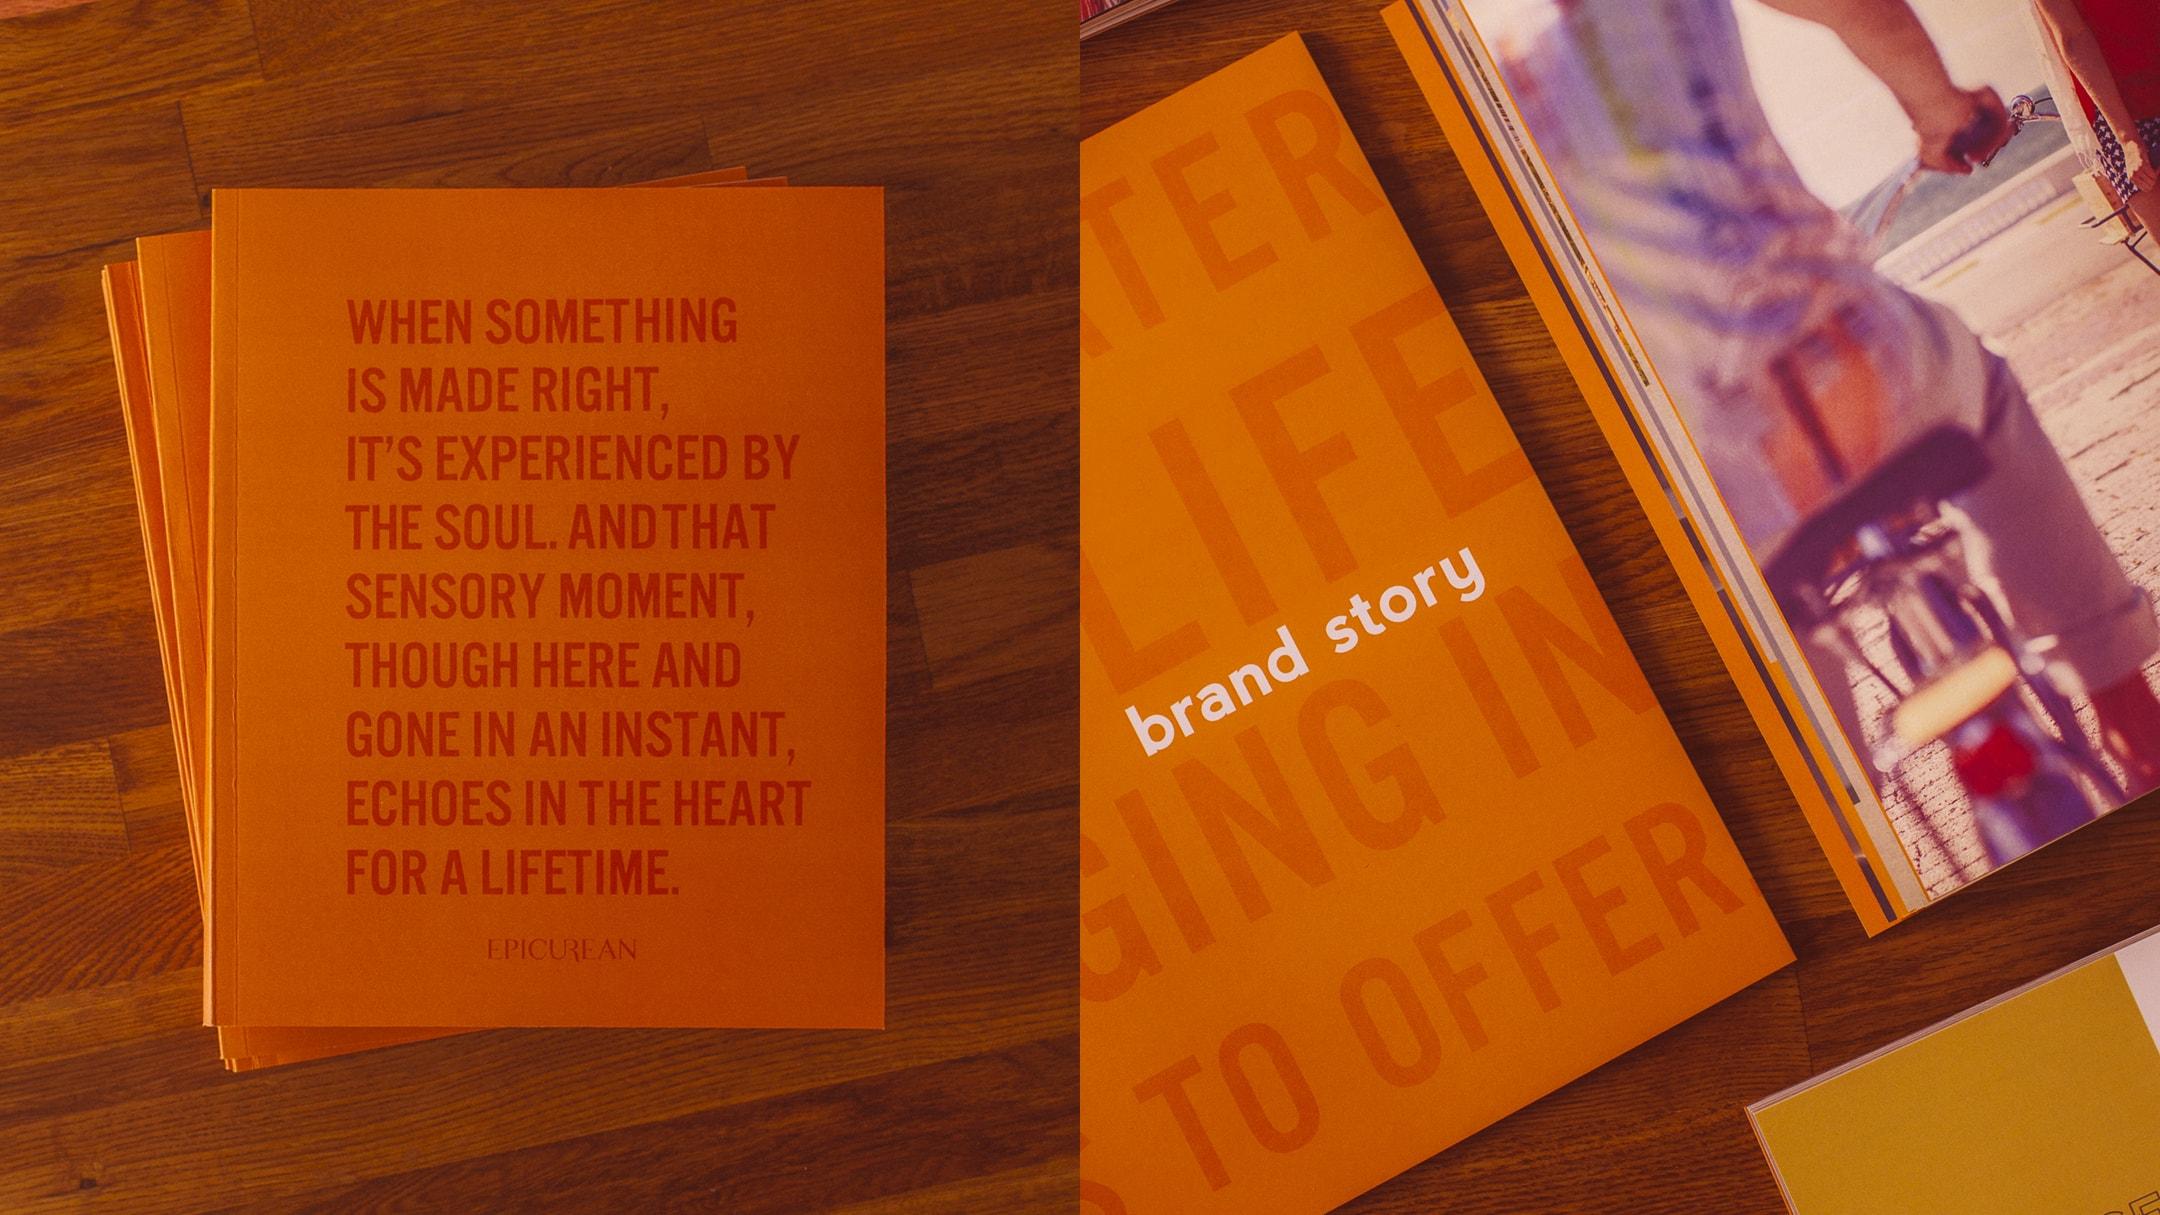 Epicurean Hotel brand book cover